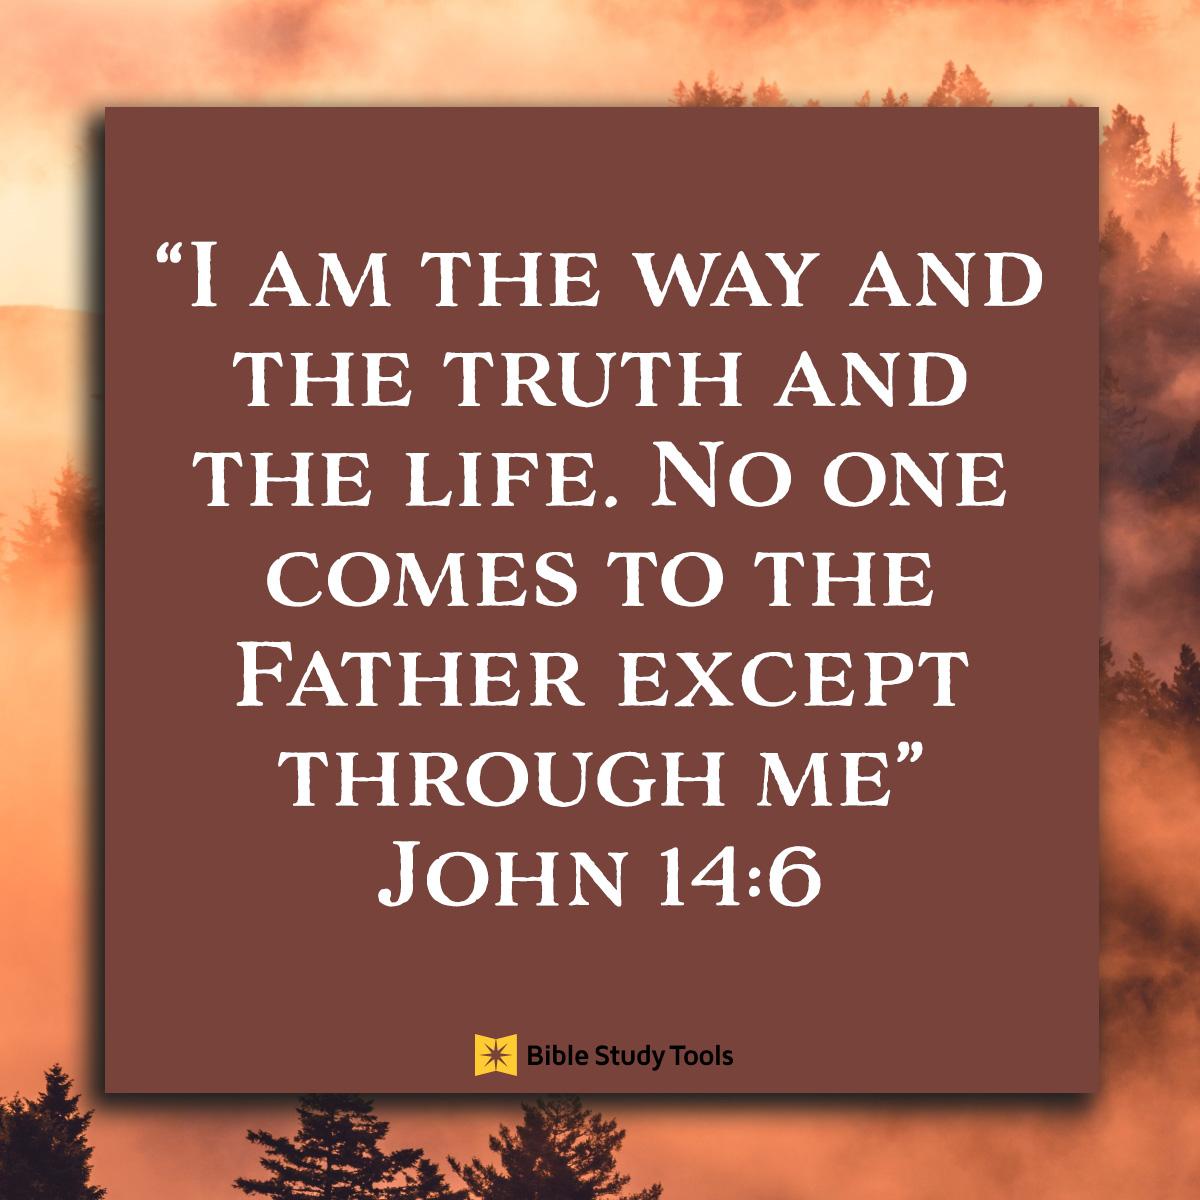 John 14:6, inspirational image